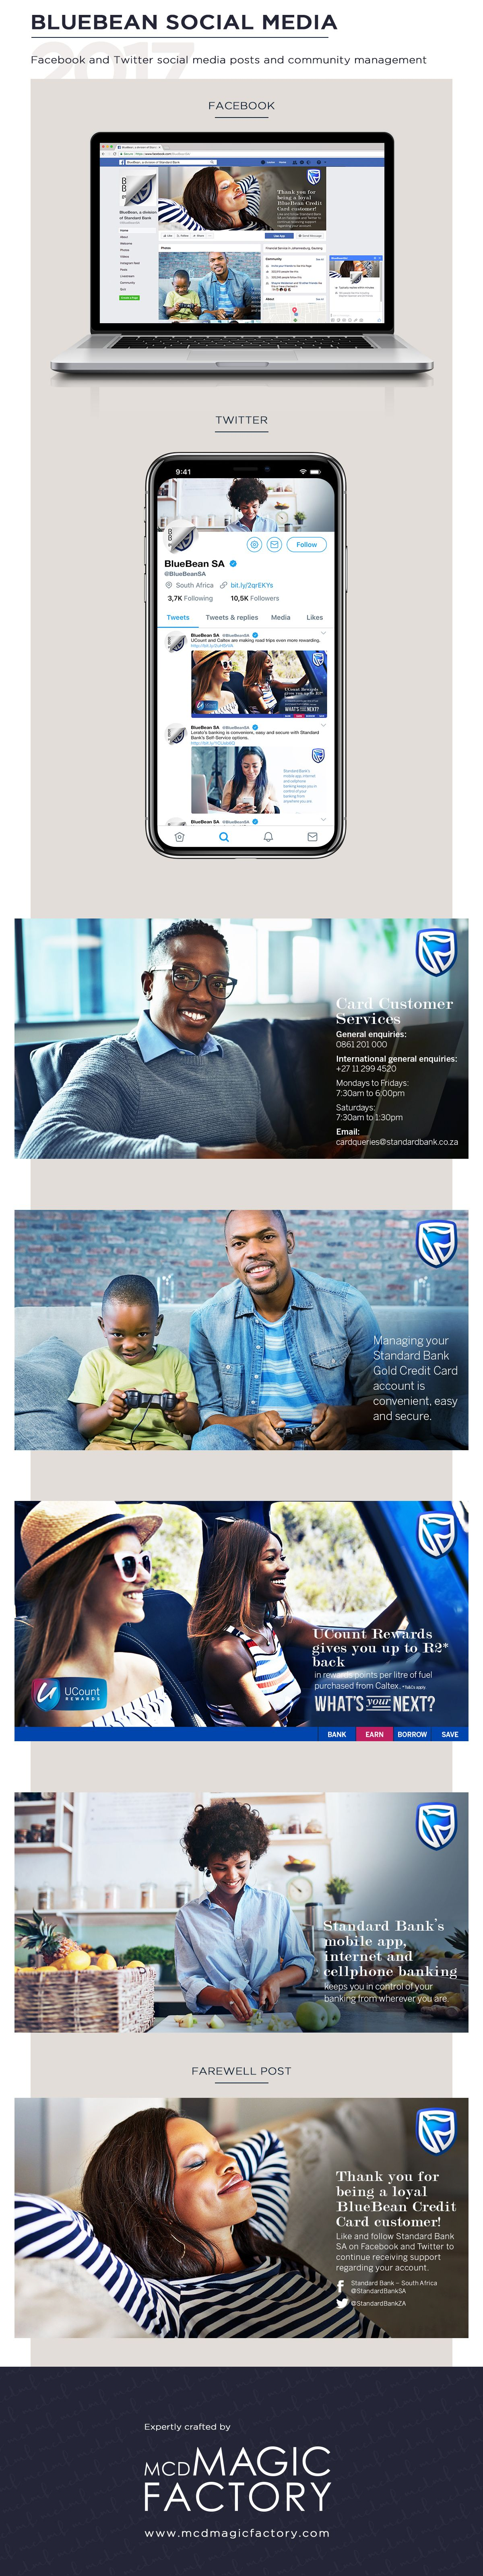 Client standard bank bluebean credit card year 2017